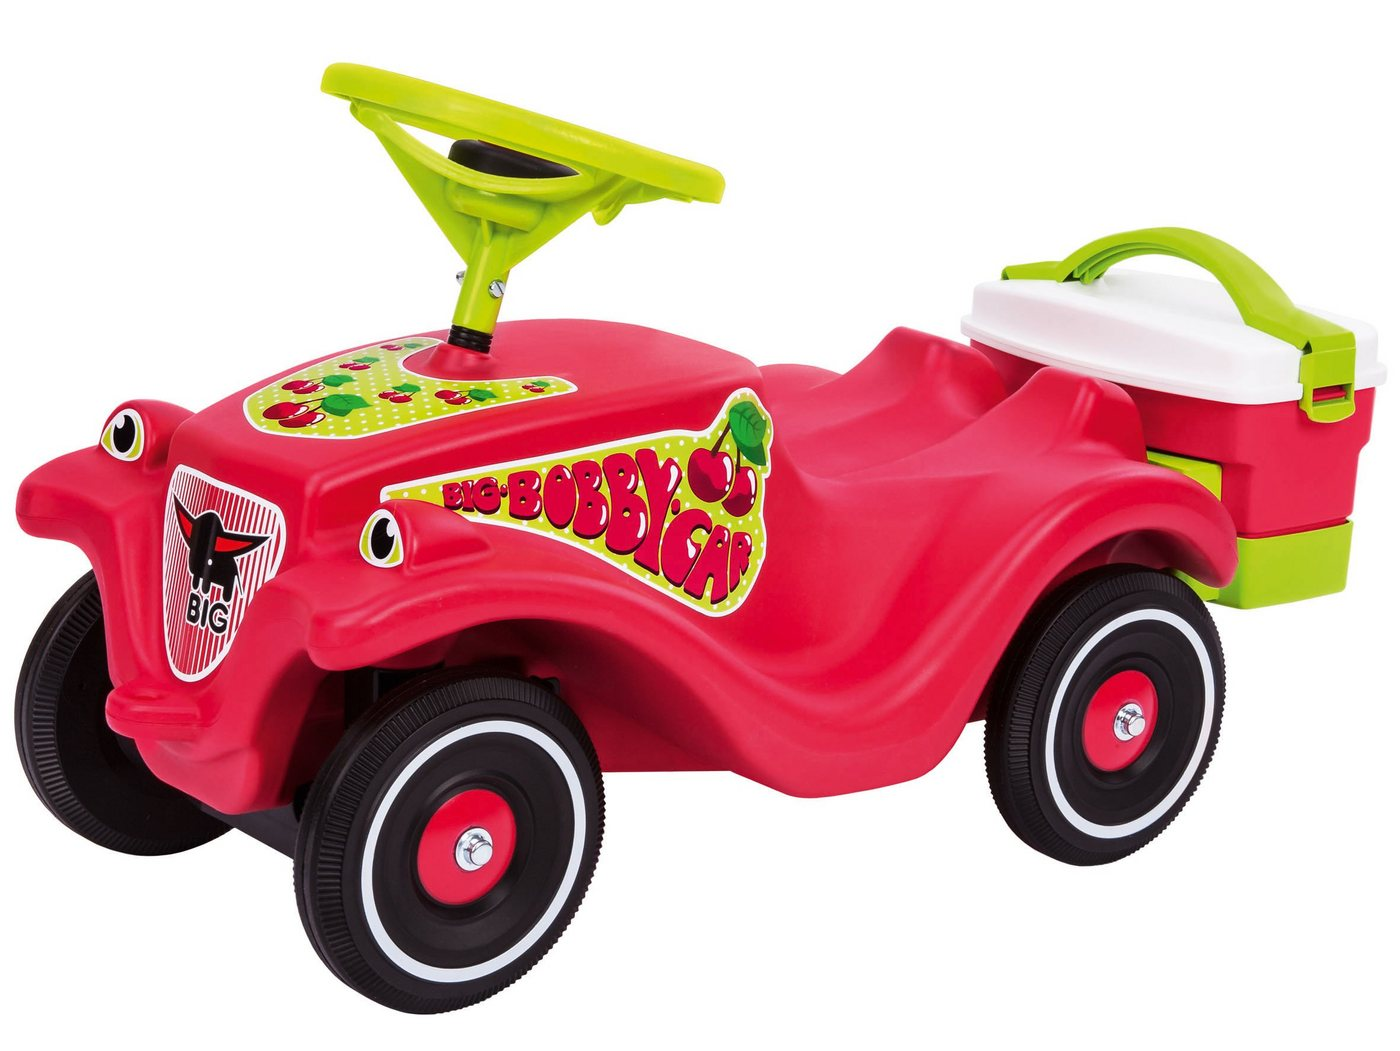 BIG Rutscherauto mit Picknickkoffer, »BIG Bobby Car Classic Cherry Girl«